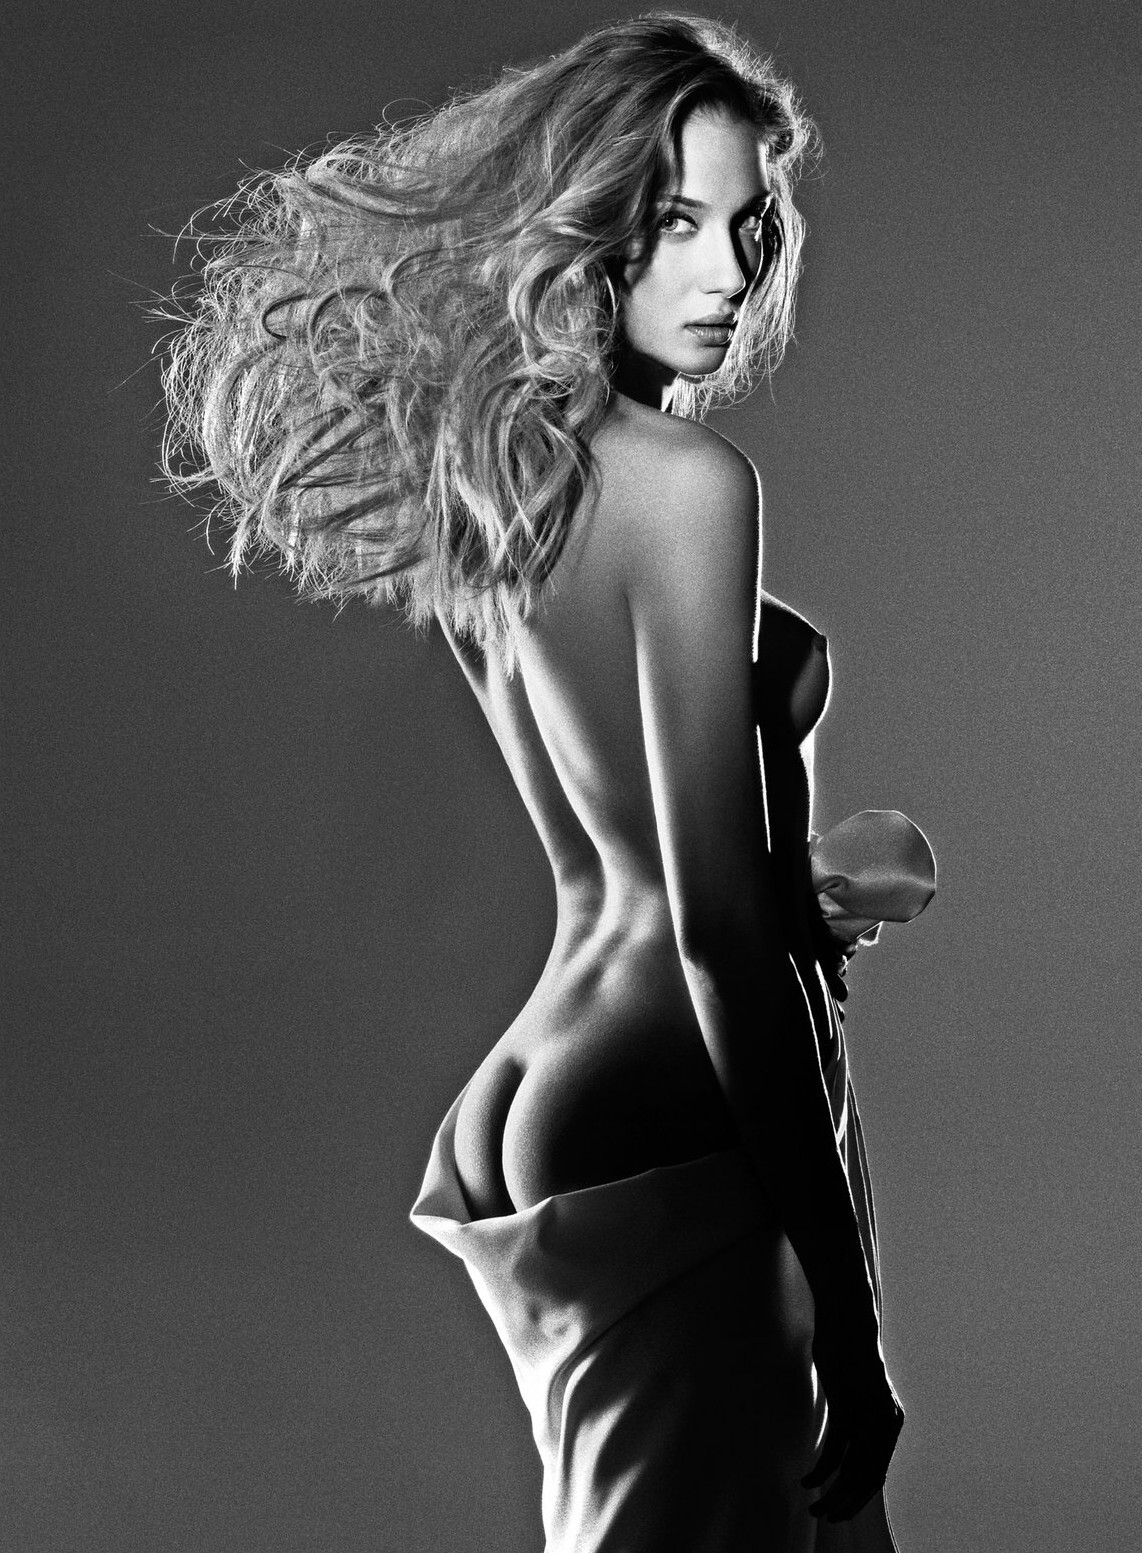 Фотограф Марко Главиано